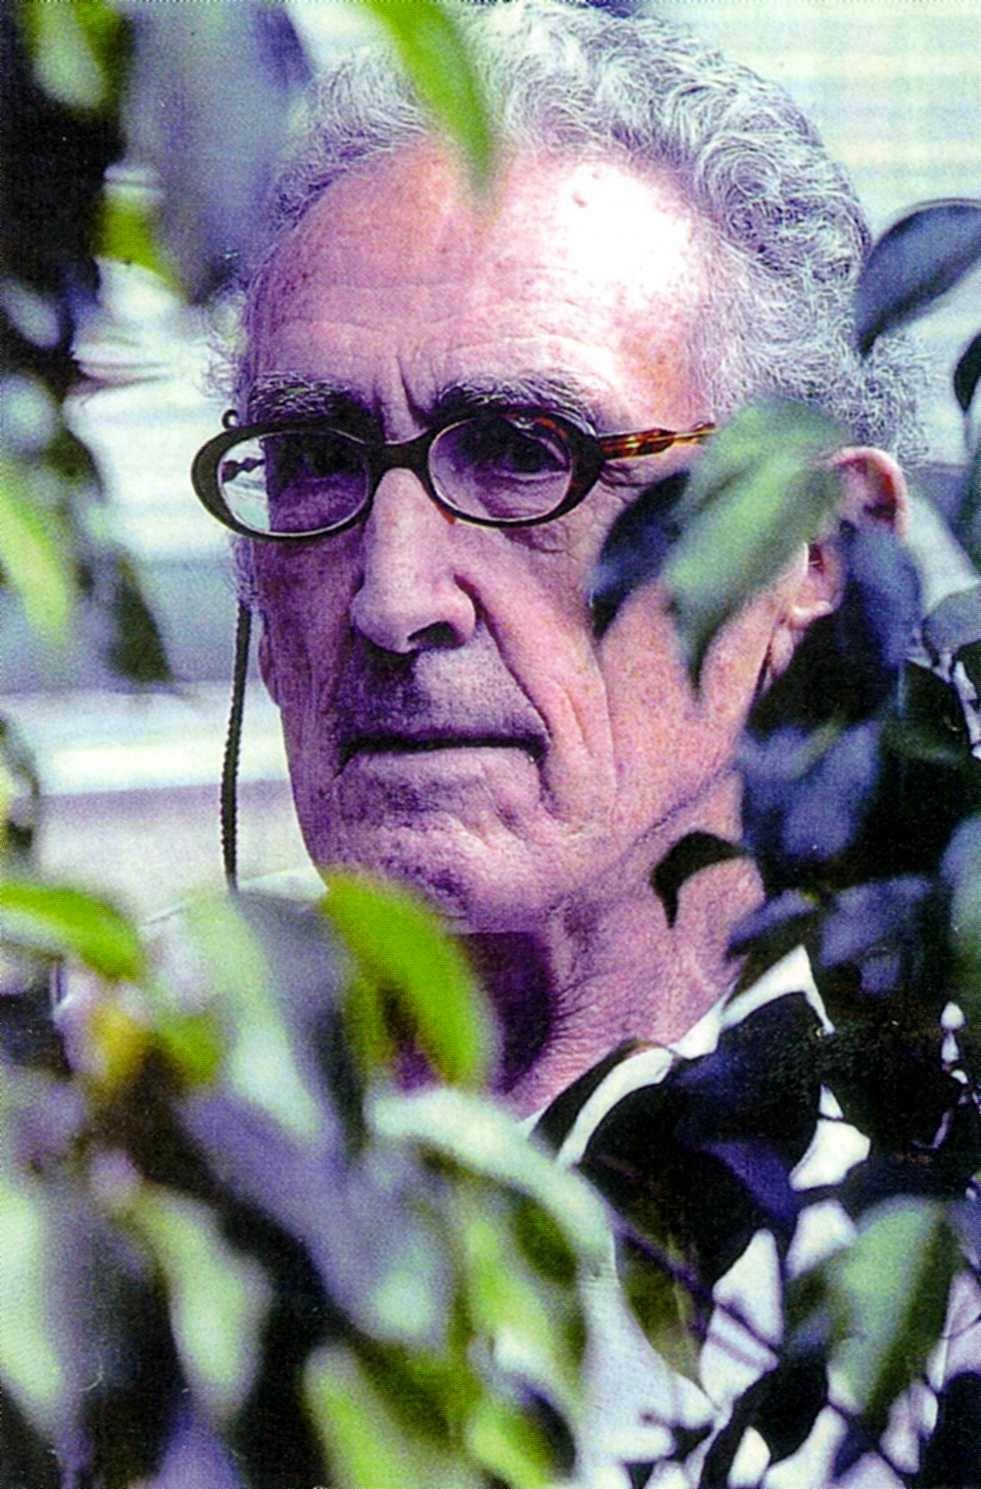 Eduard Pons Prades